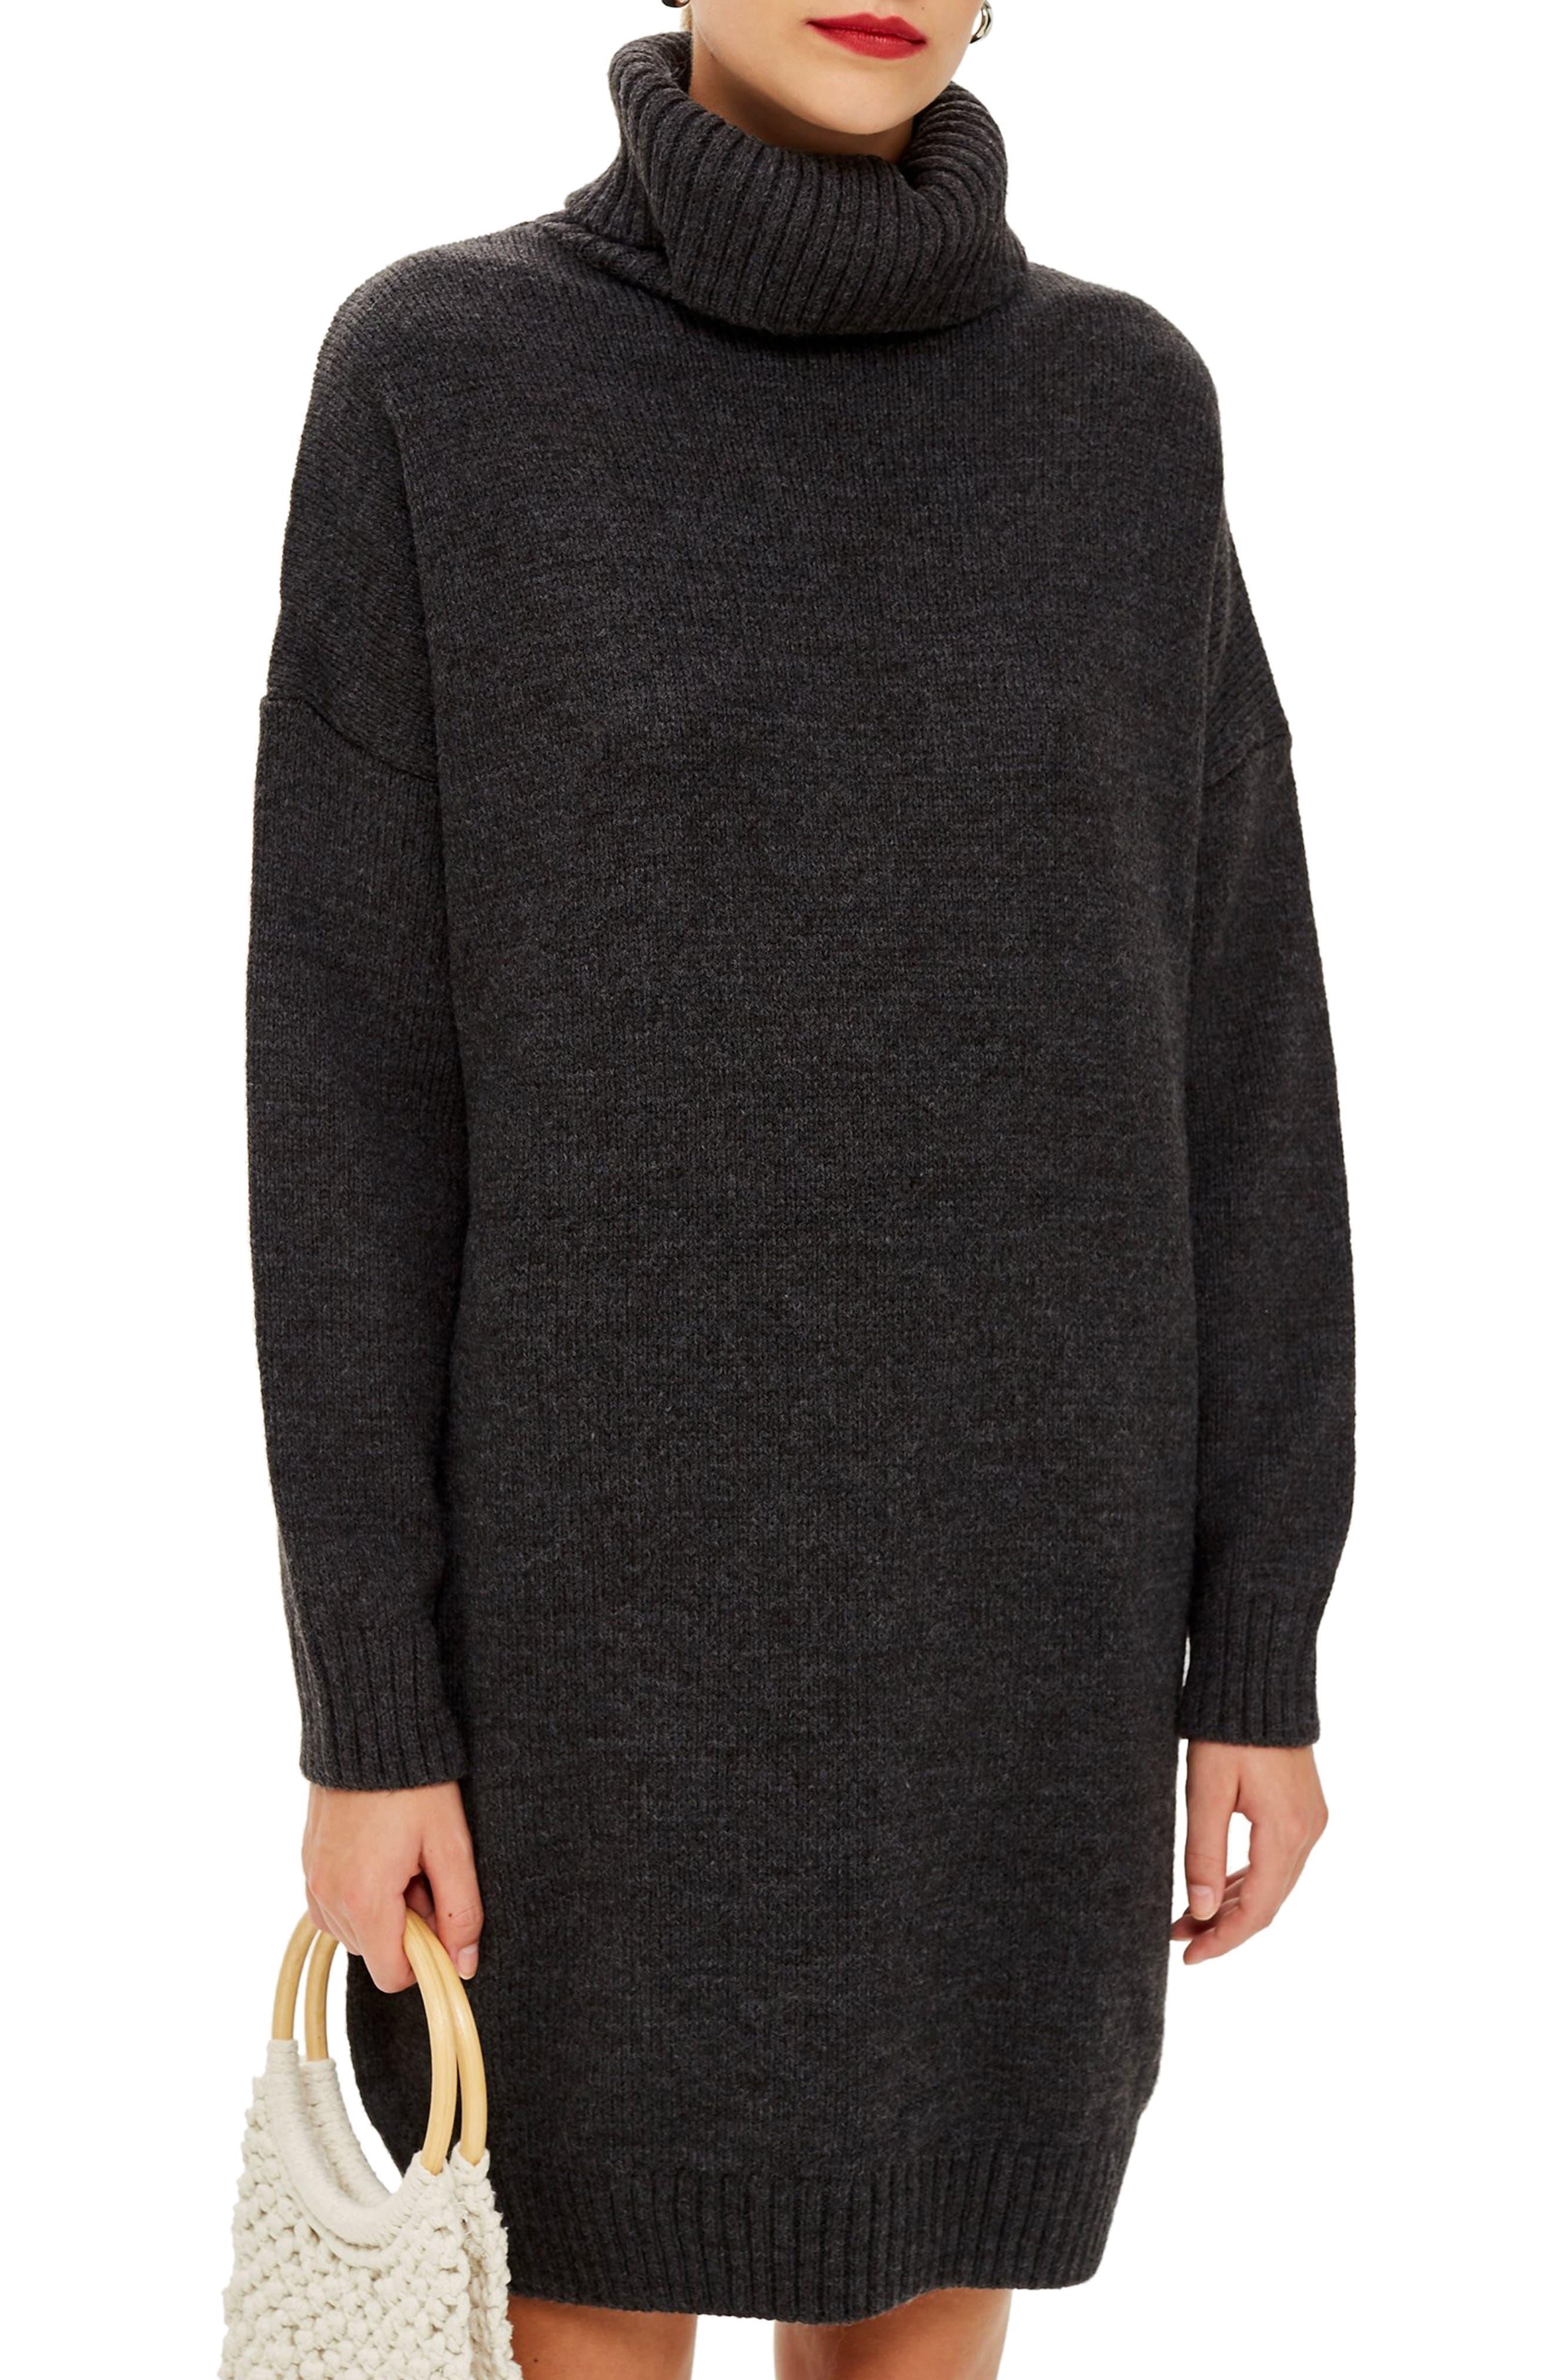 Topshop Turtleneck Sweater Dress, US (fits like 0-2) - Grey